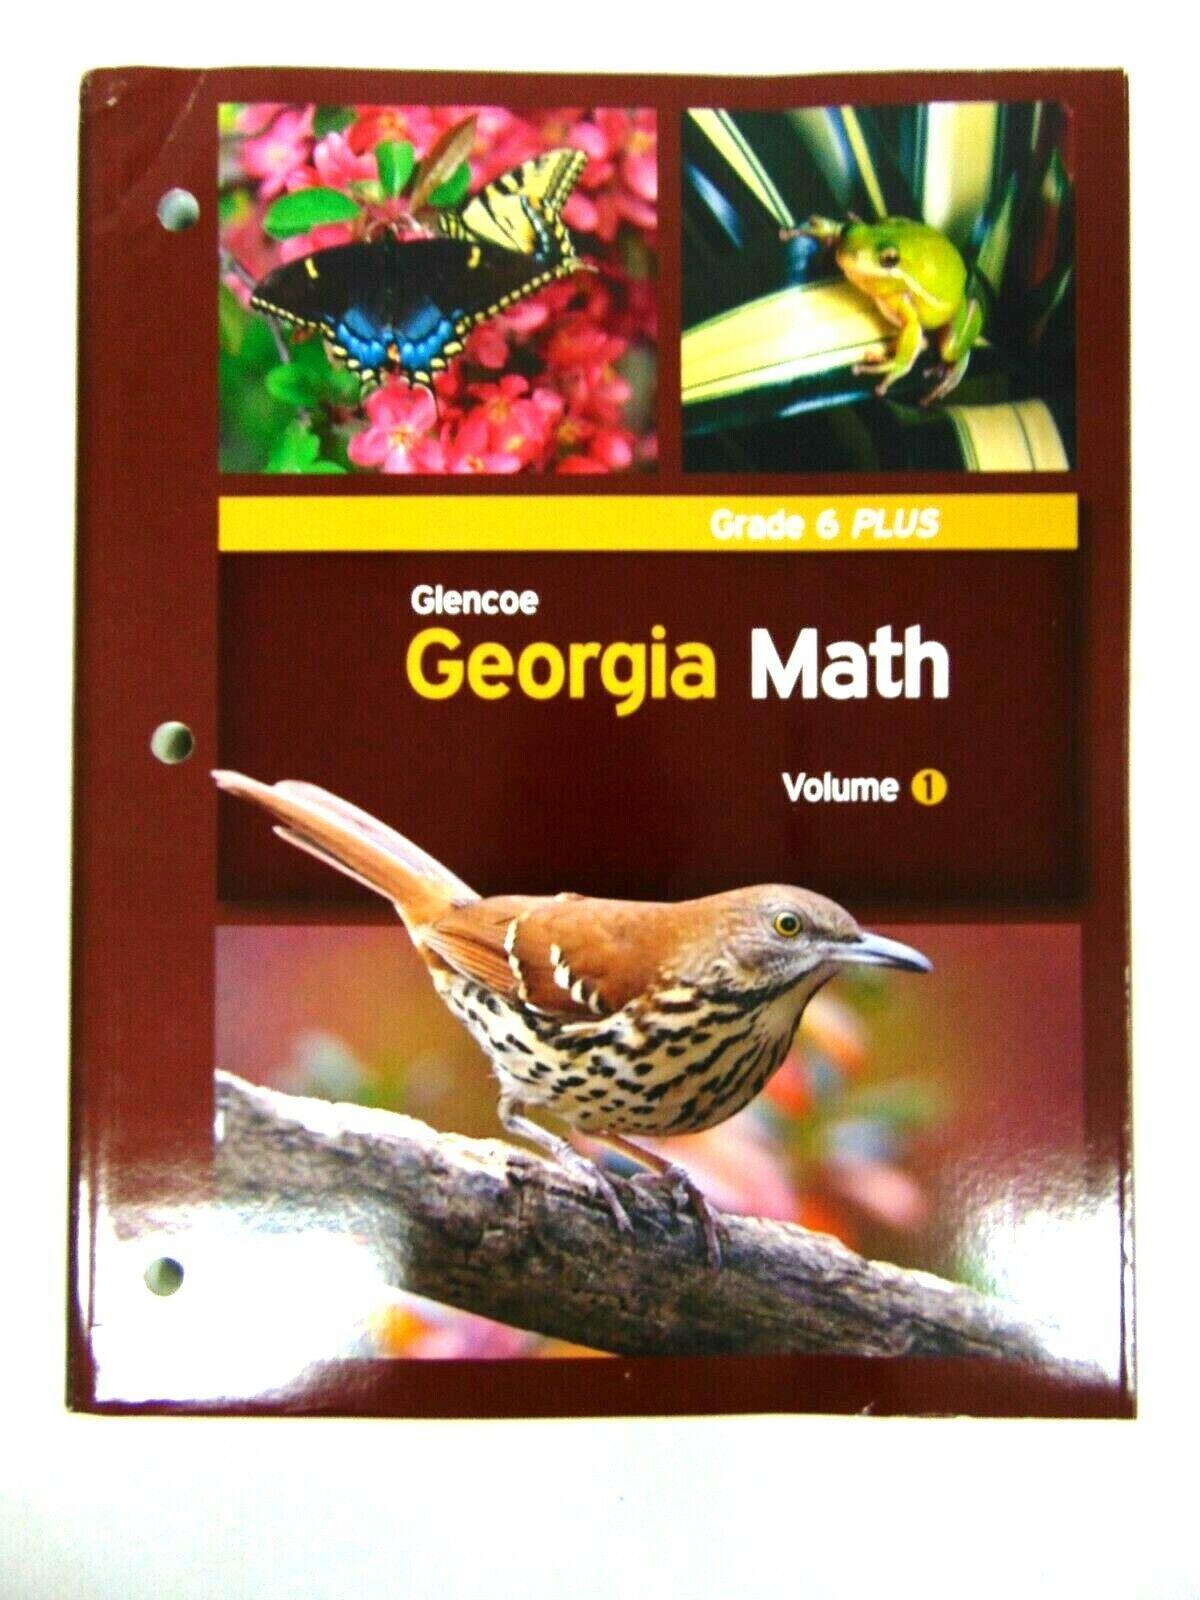 Glencoe Georgia Math Grade 6 Volume 1